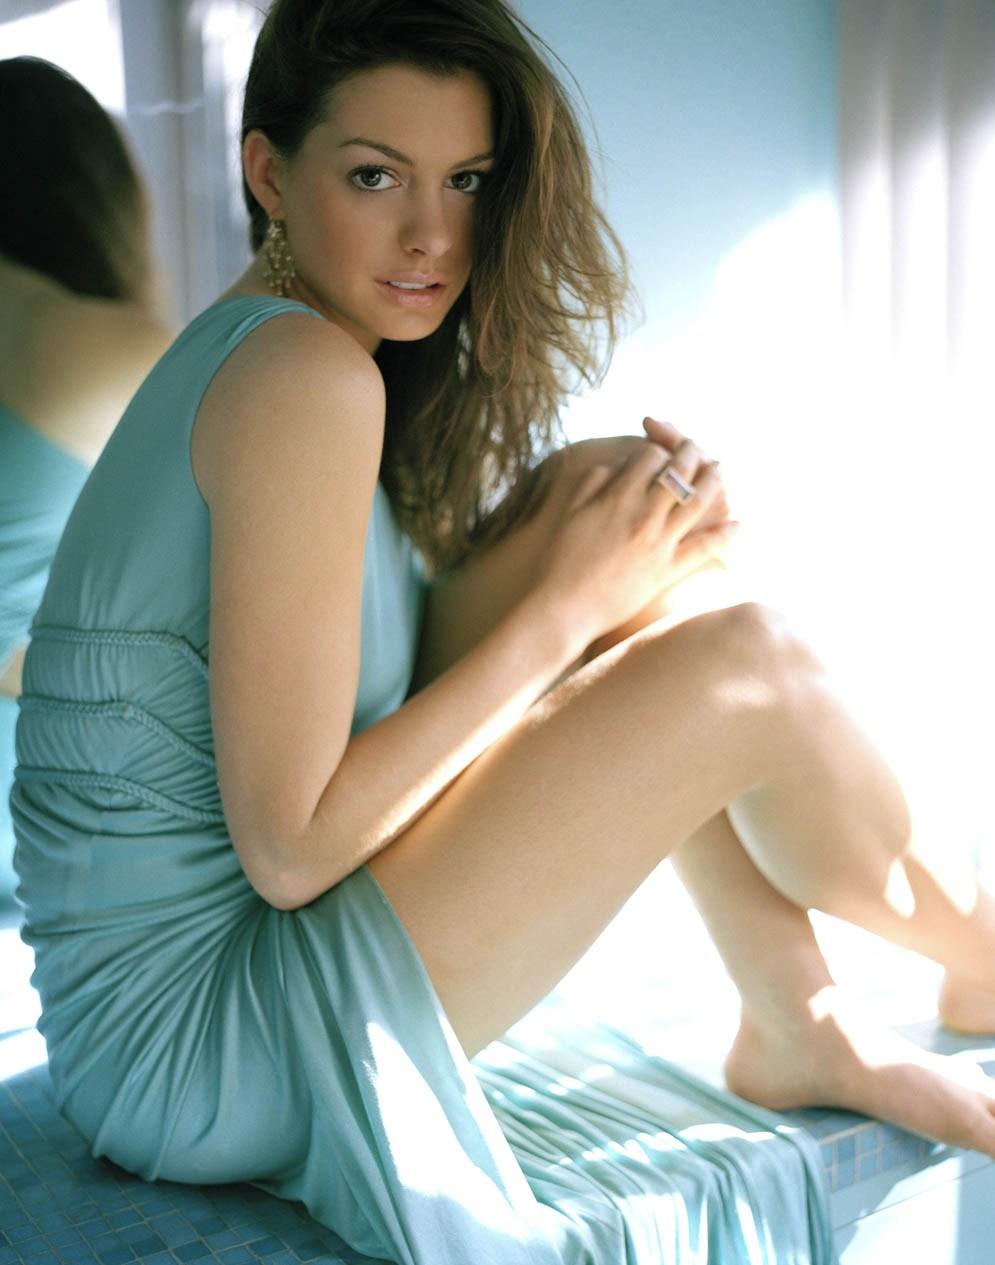 Anne-Hathaway-Hot-Legs-Bare-Feet-wallpaper-wp4404520